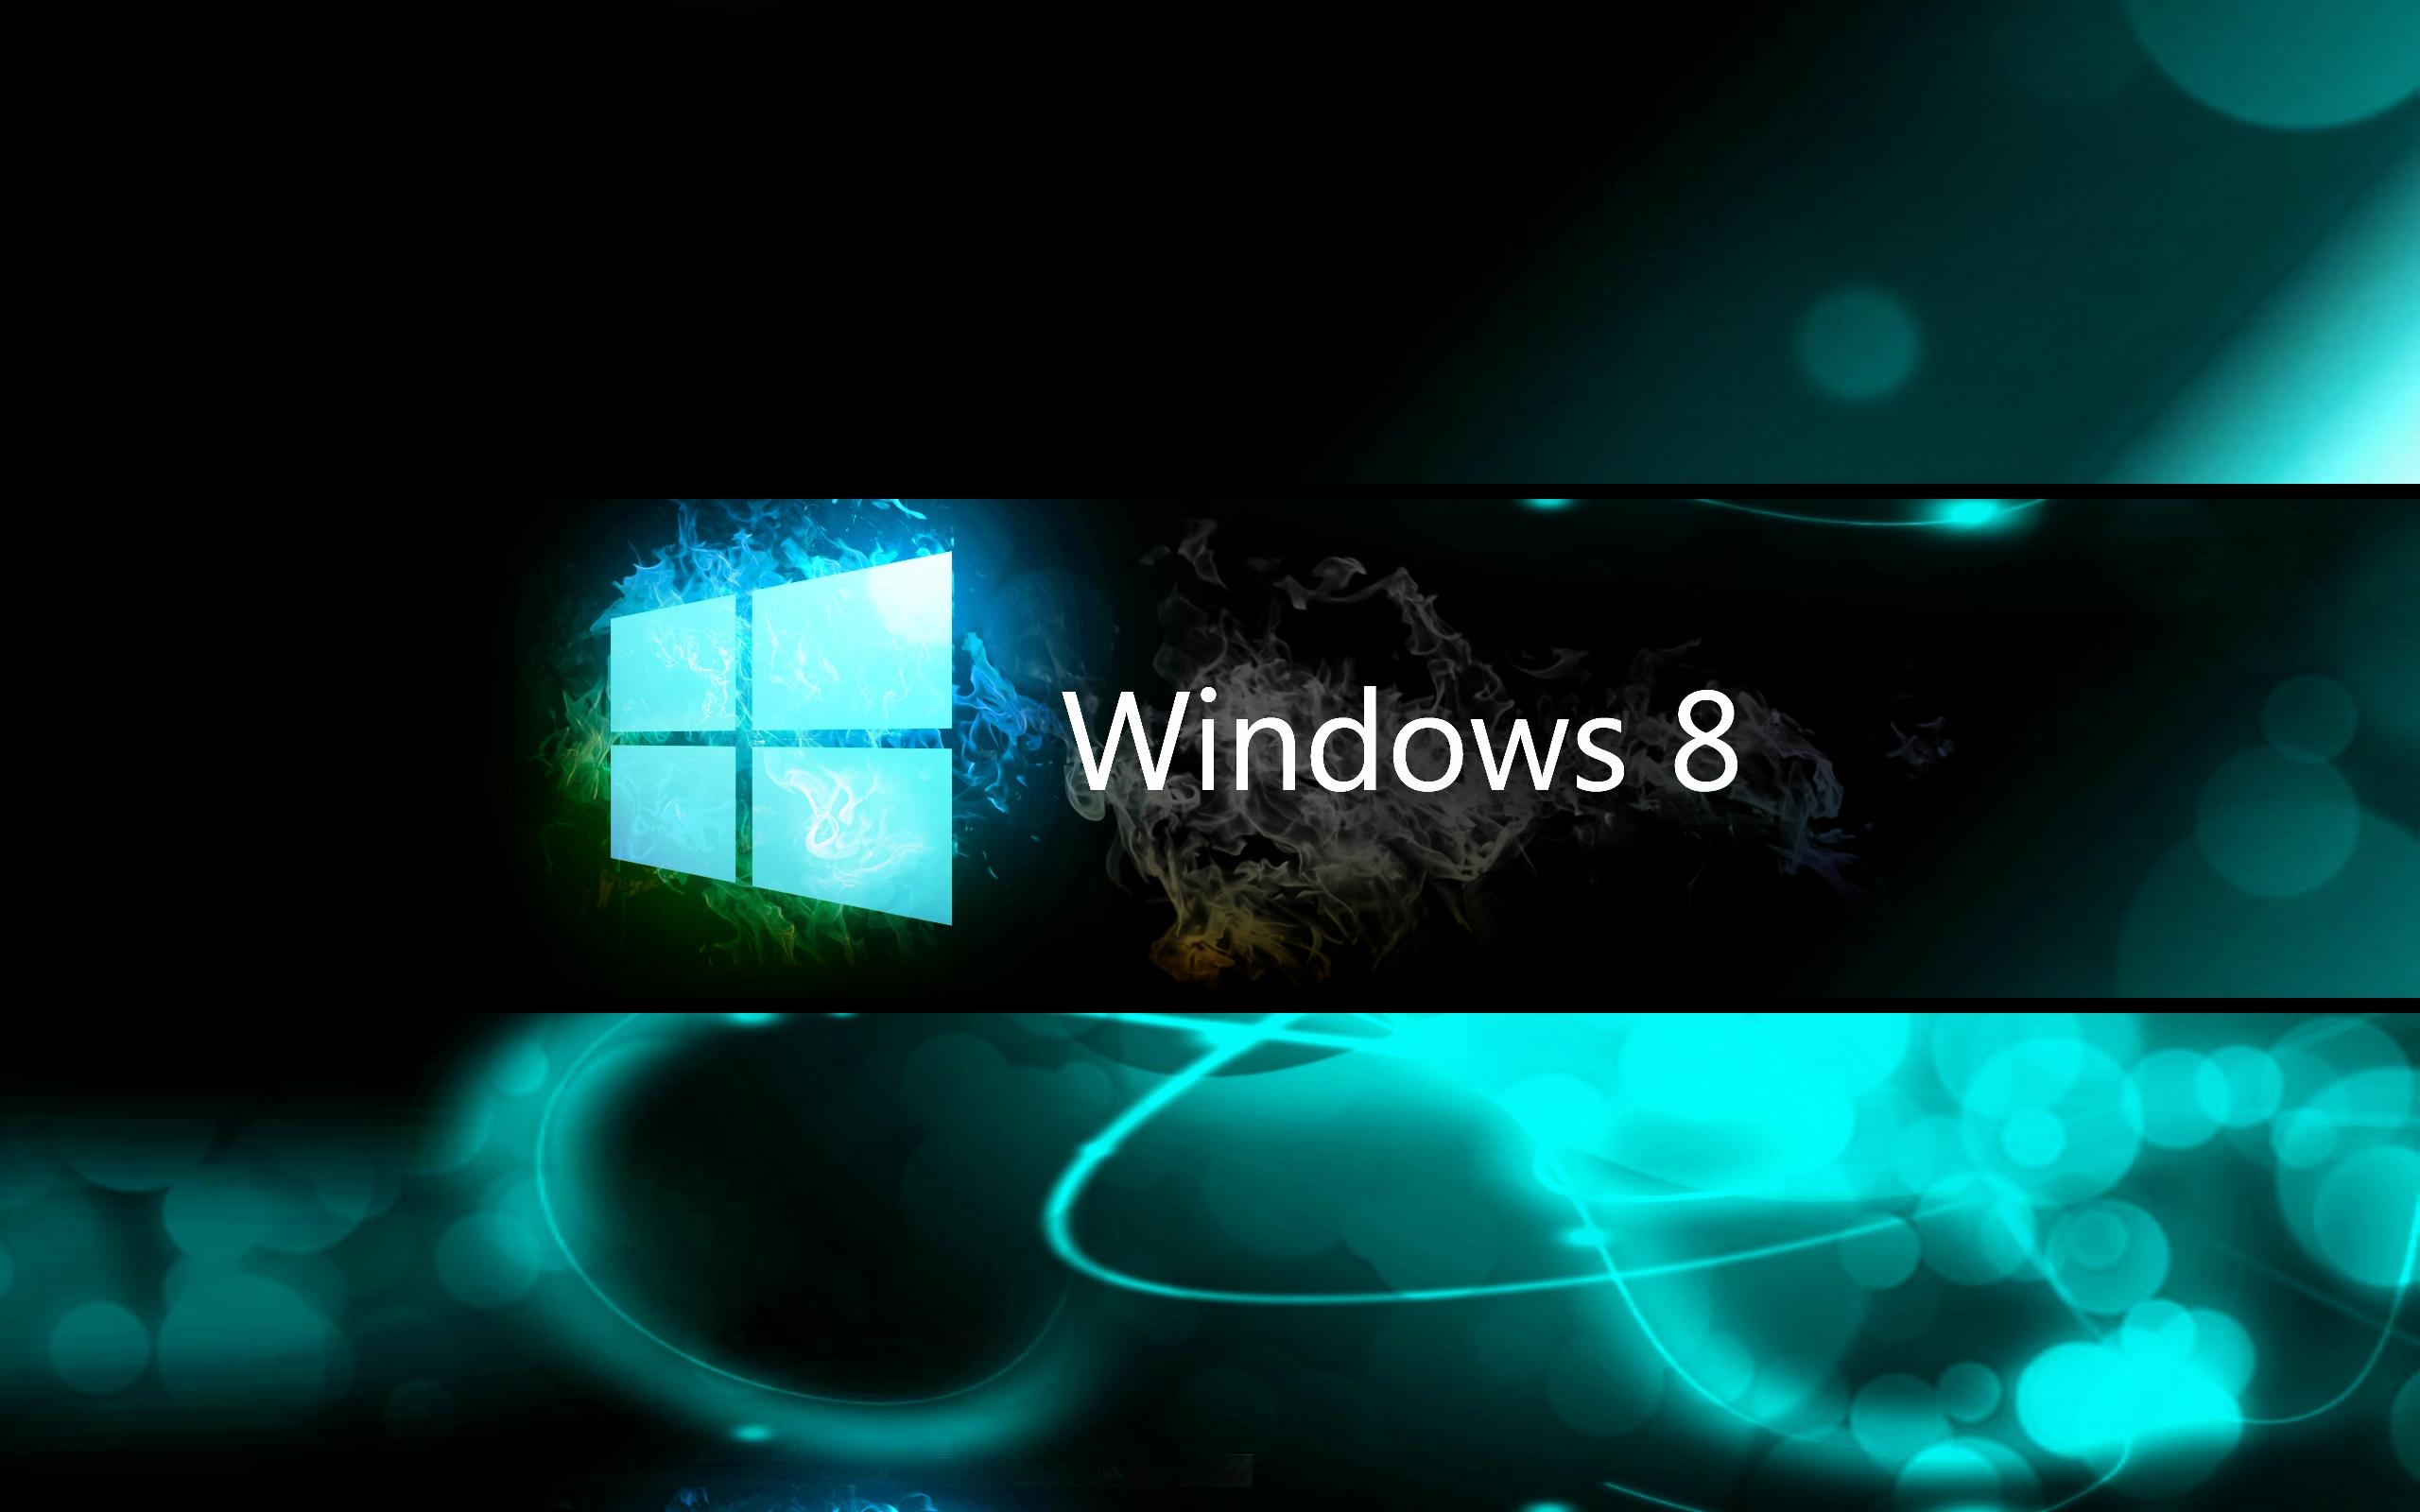 Windows 8 Wallpapers 29